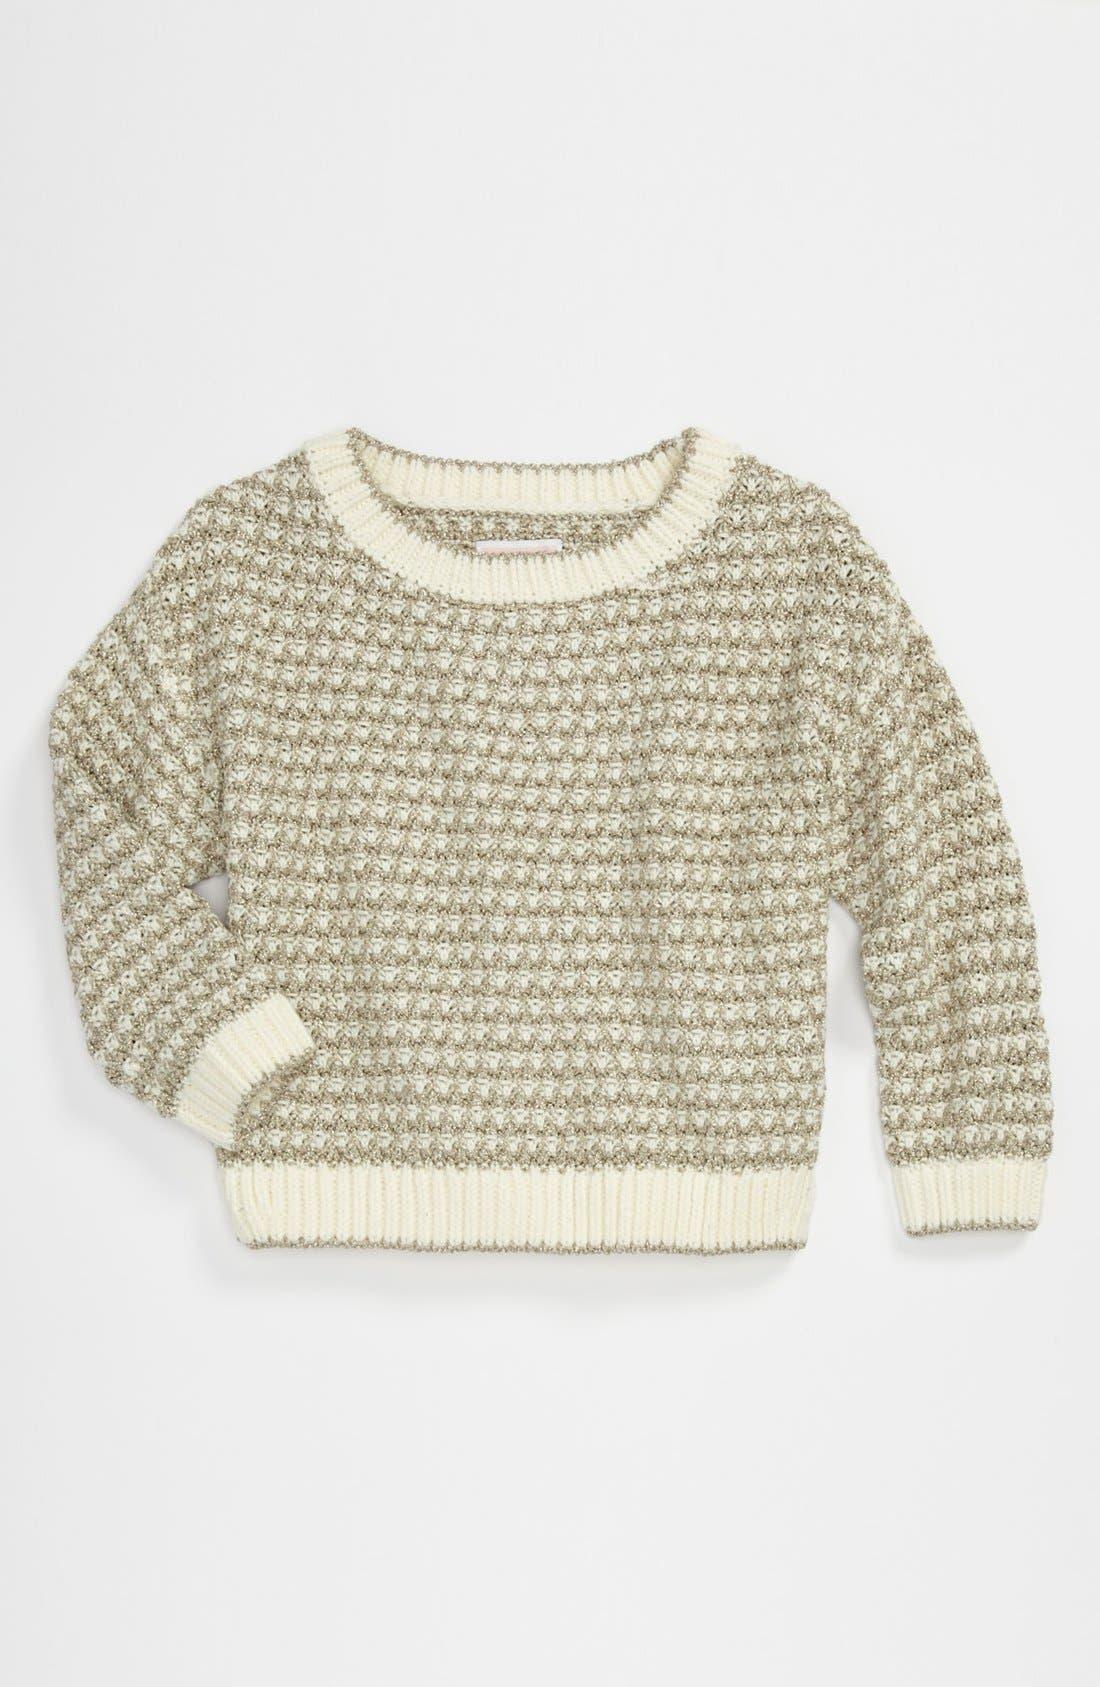 Main Image - Juicy Couture Metallic Sweater (Big Girls)